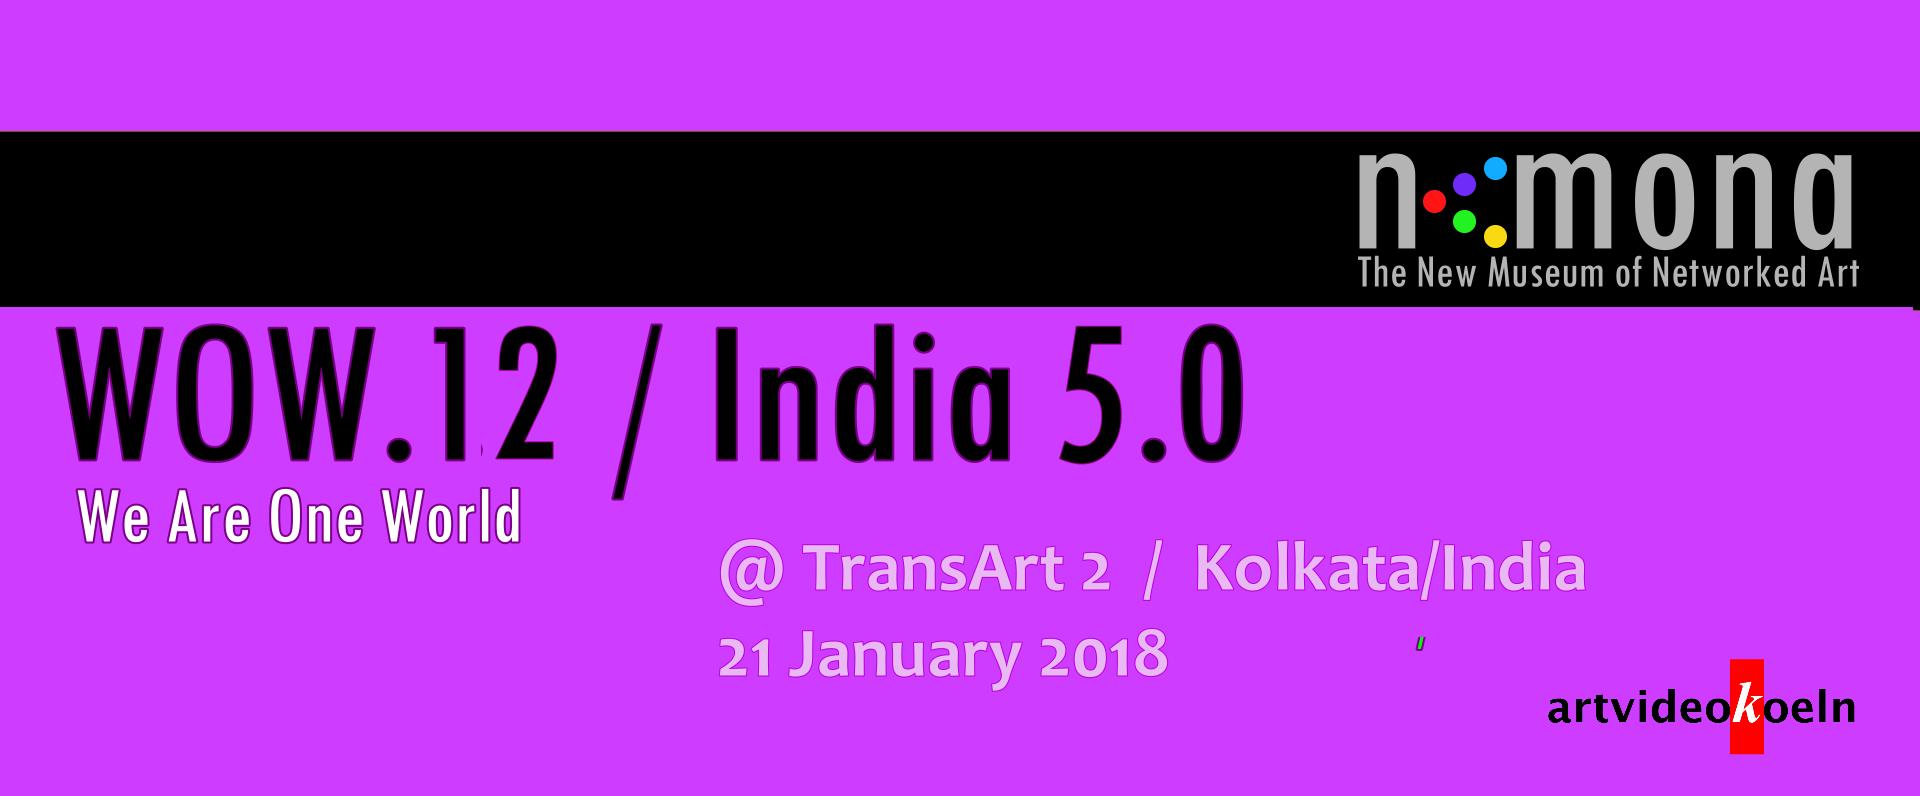 WOW.12 / India 5.0